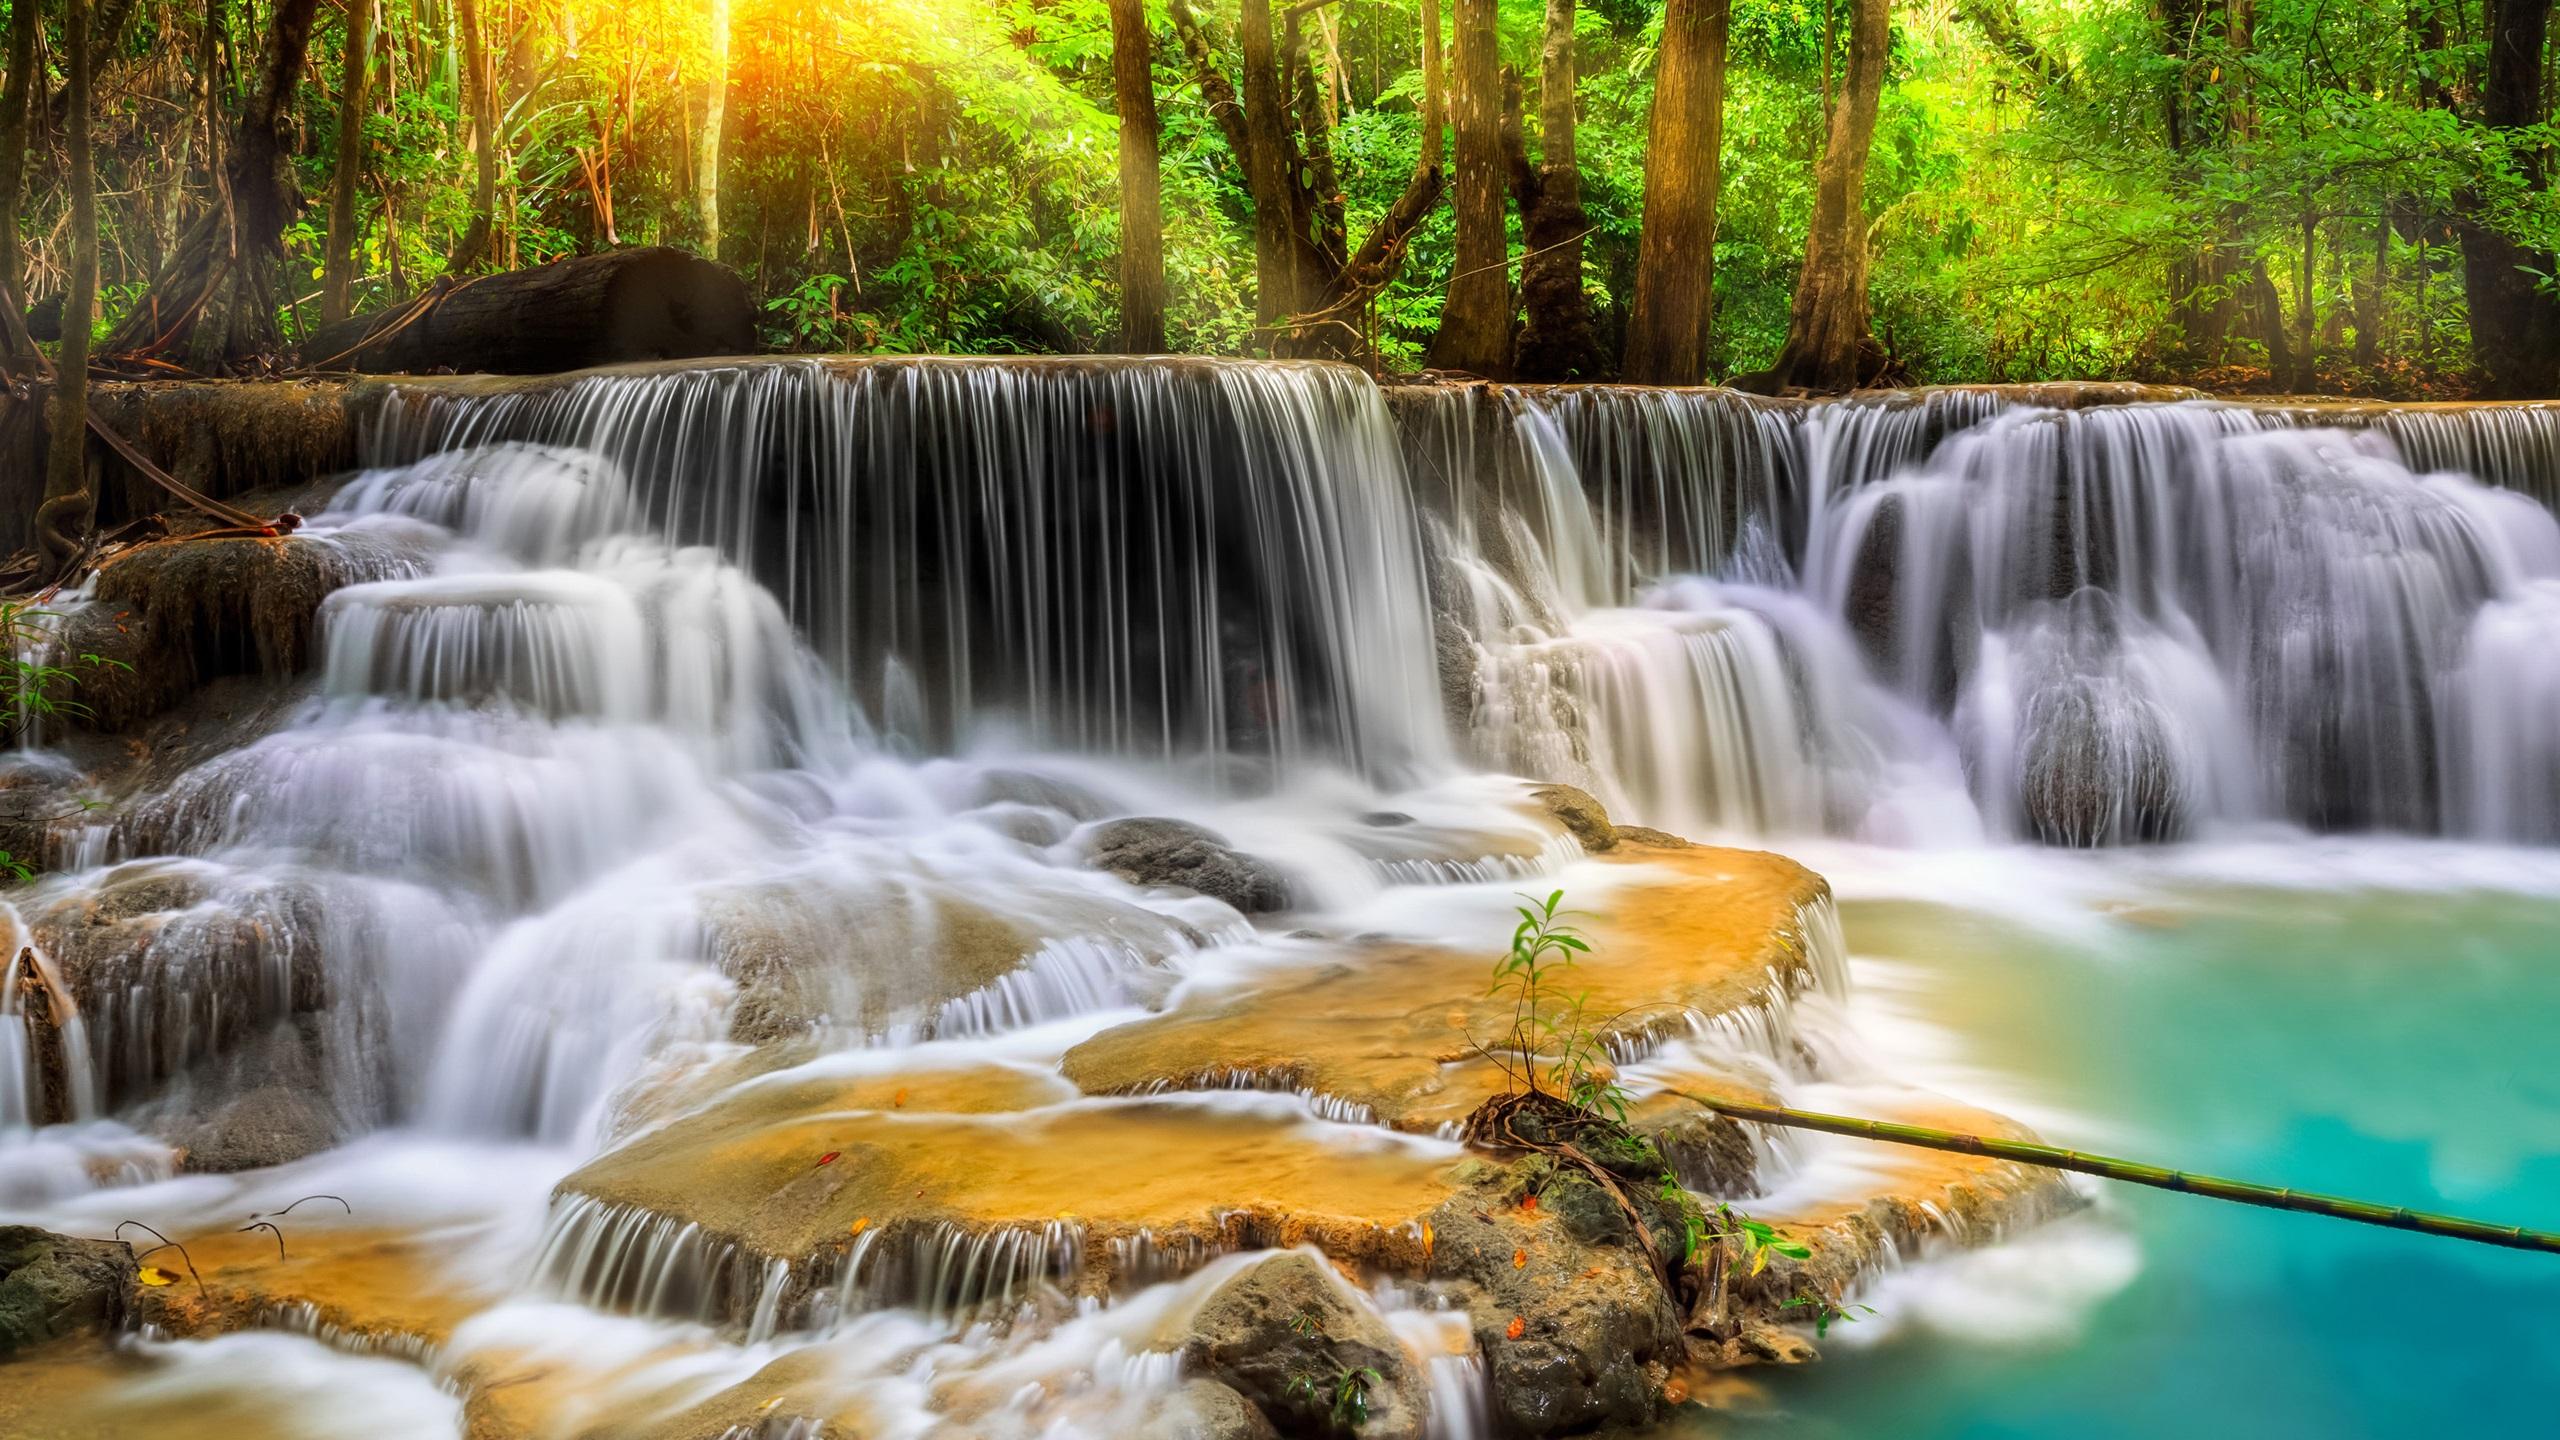 Thailand forest trees waterfalls stream 2560x1440